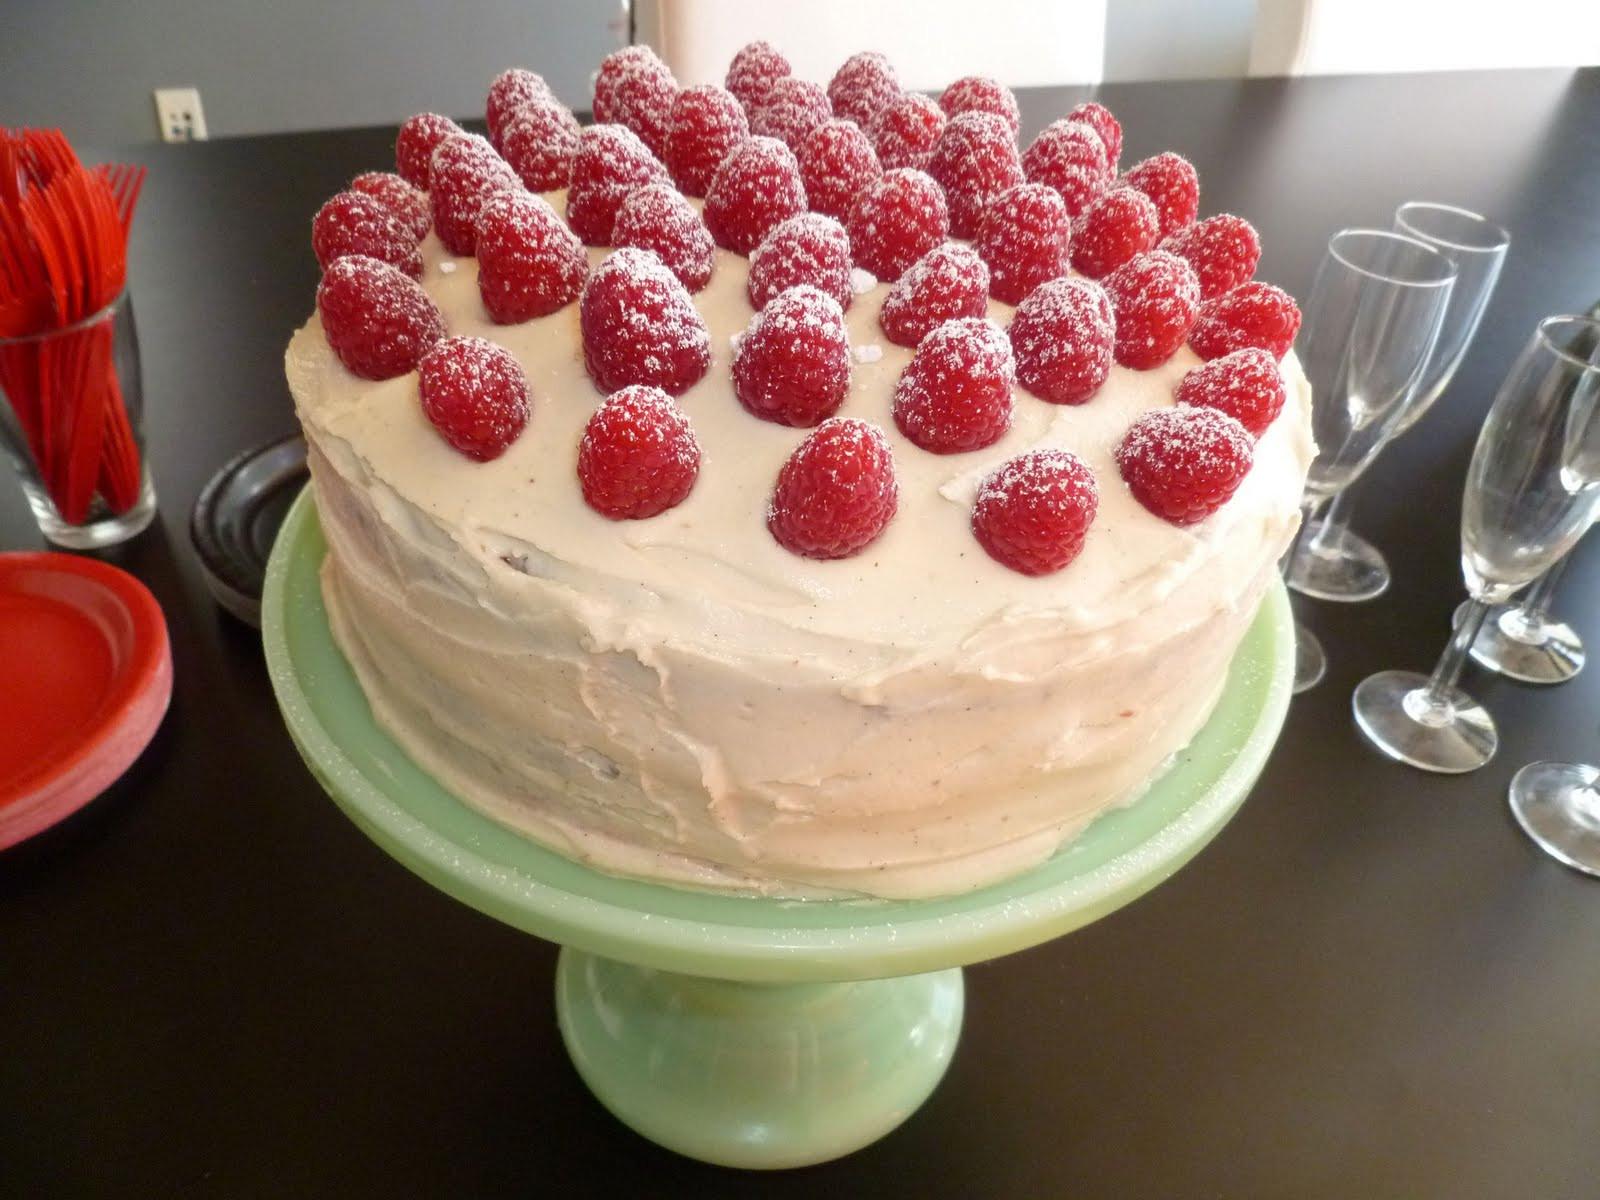 Best ideas about Vegetarian Birthday Cake Recipes . Save or Pin Savvy Vegan Homemade Vegan Birthday Cakes Now.